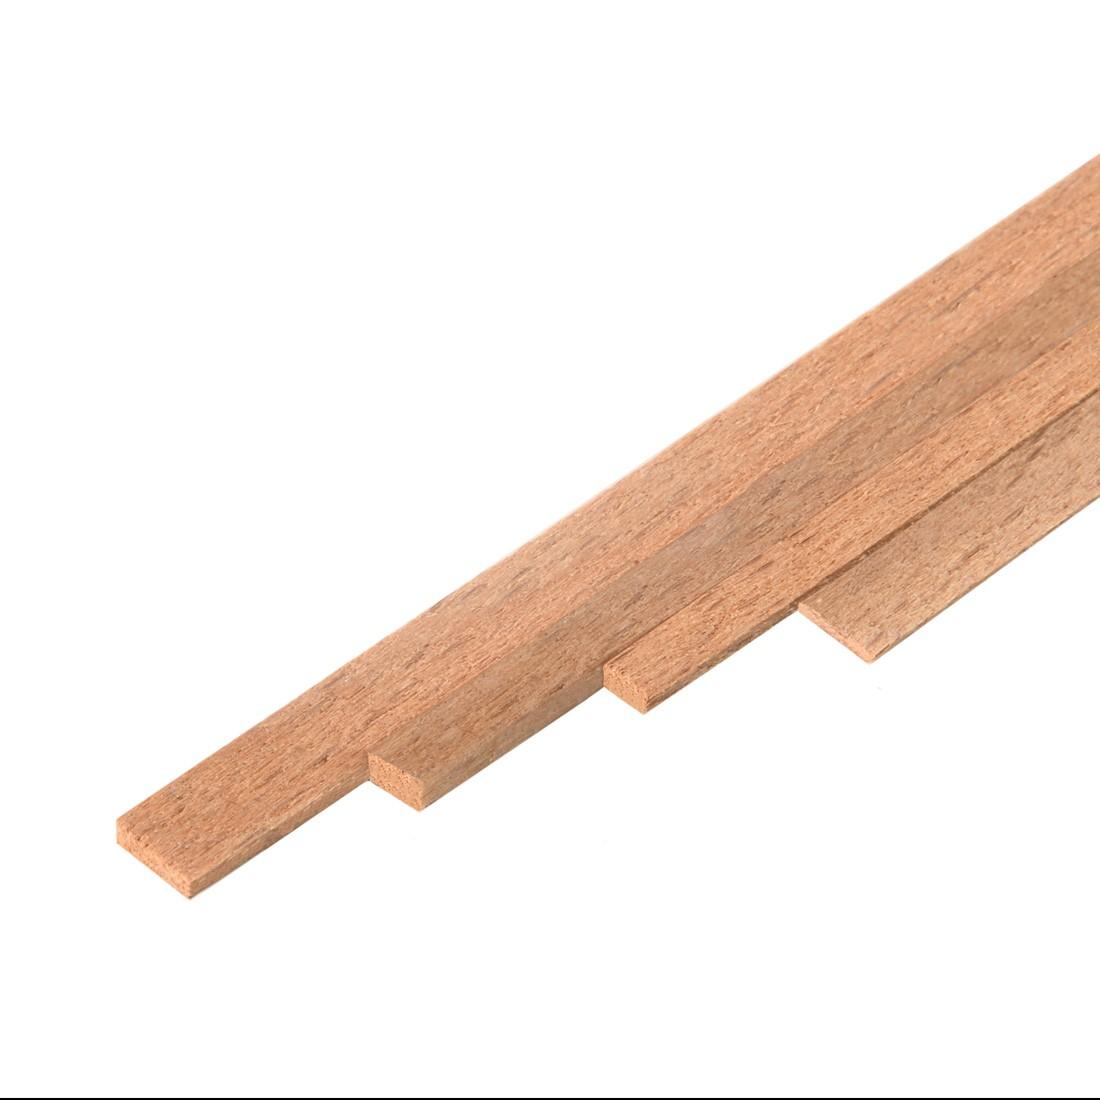 Beechwood strip mm.2x4